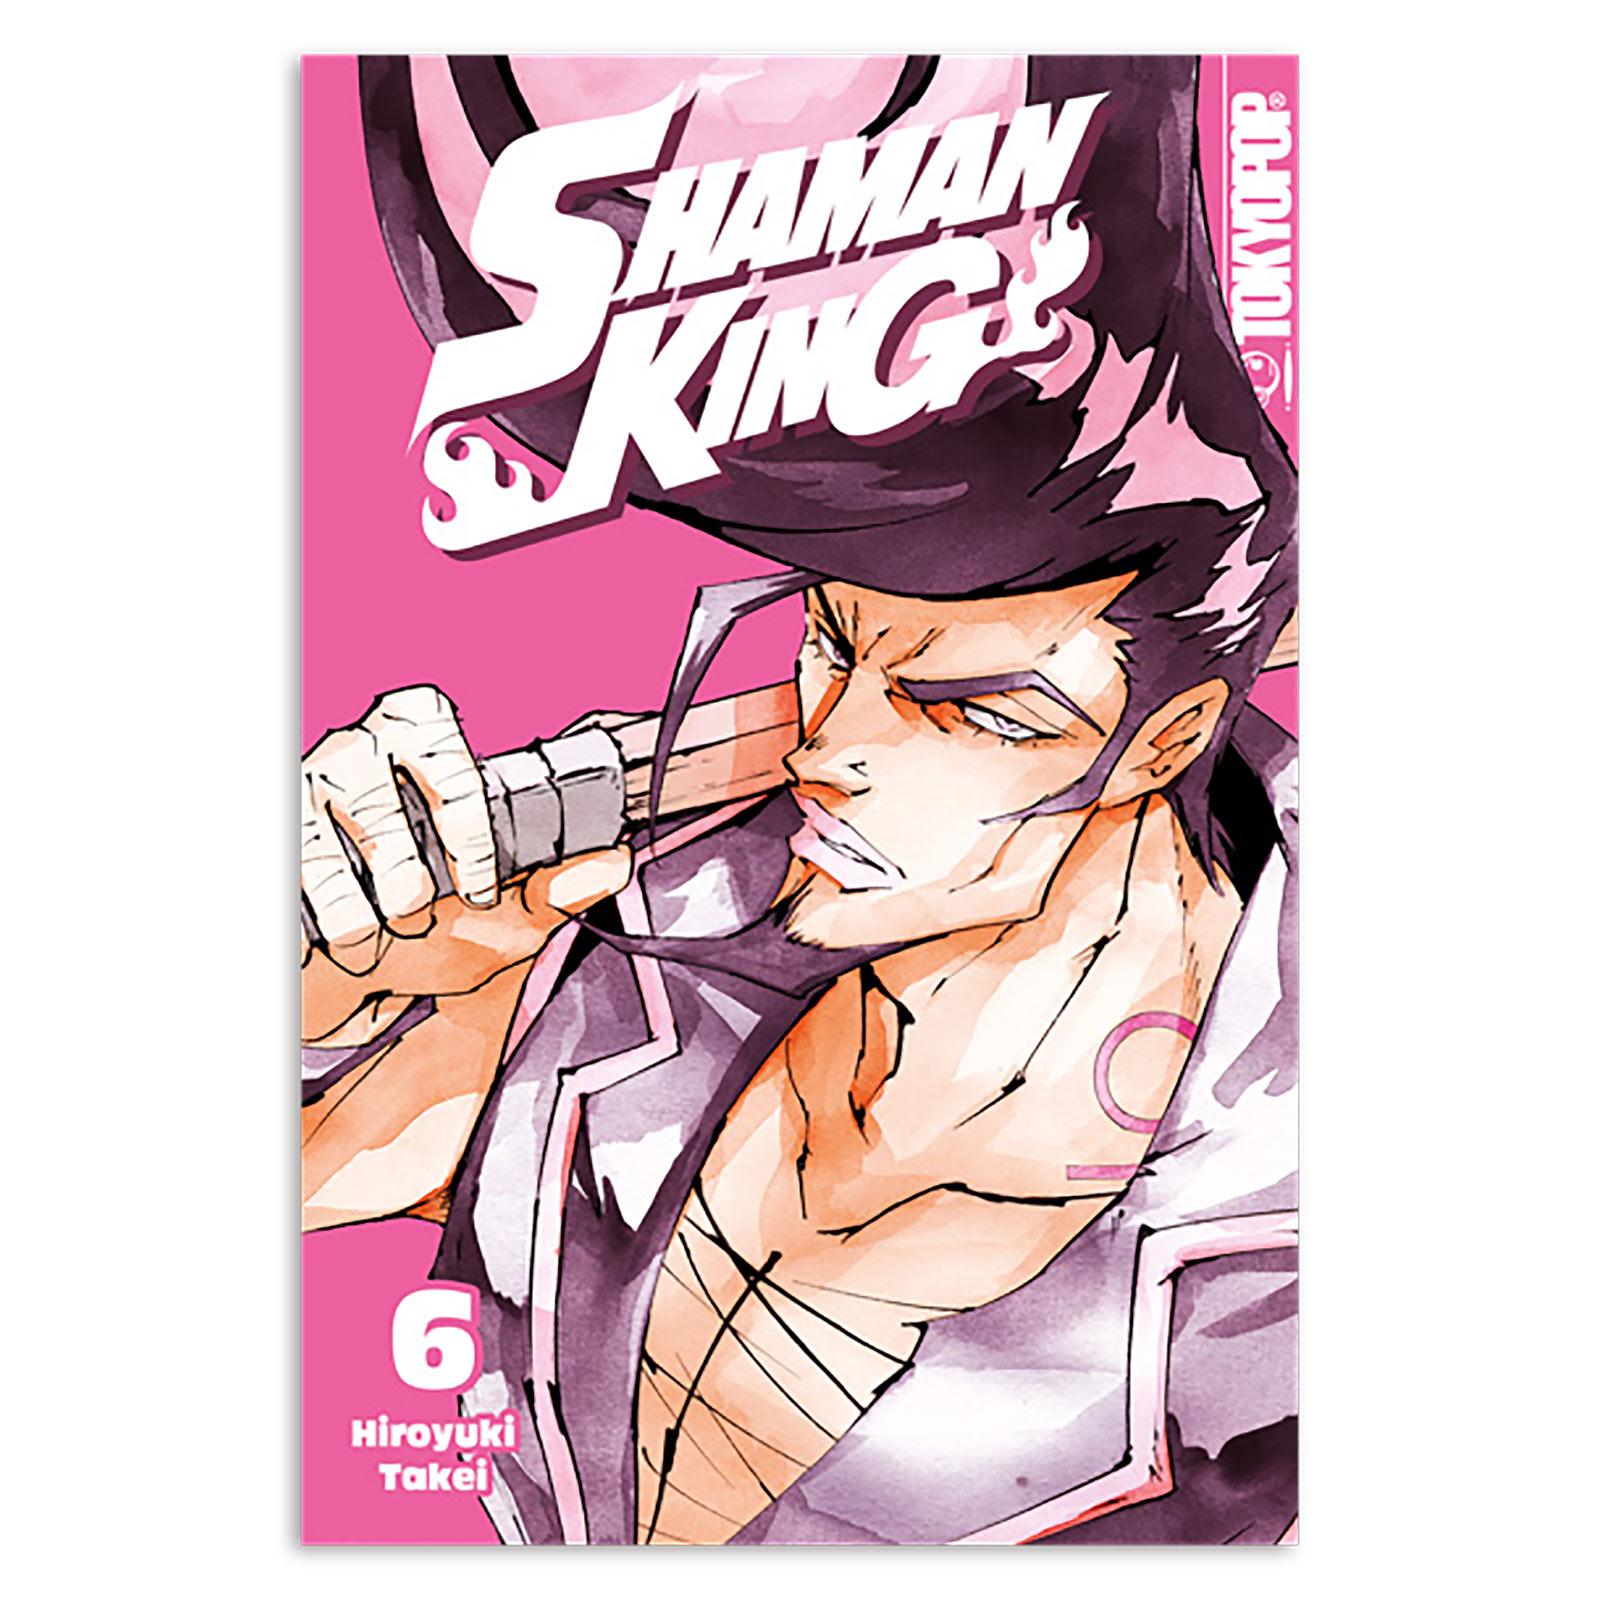 Shaman King - Band 6 Taschenbuch